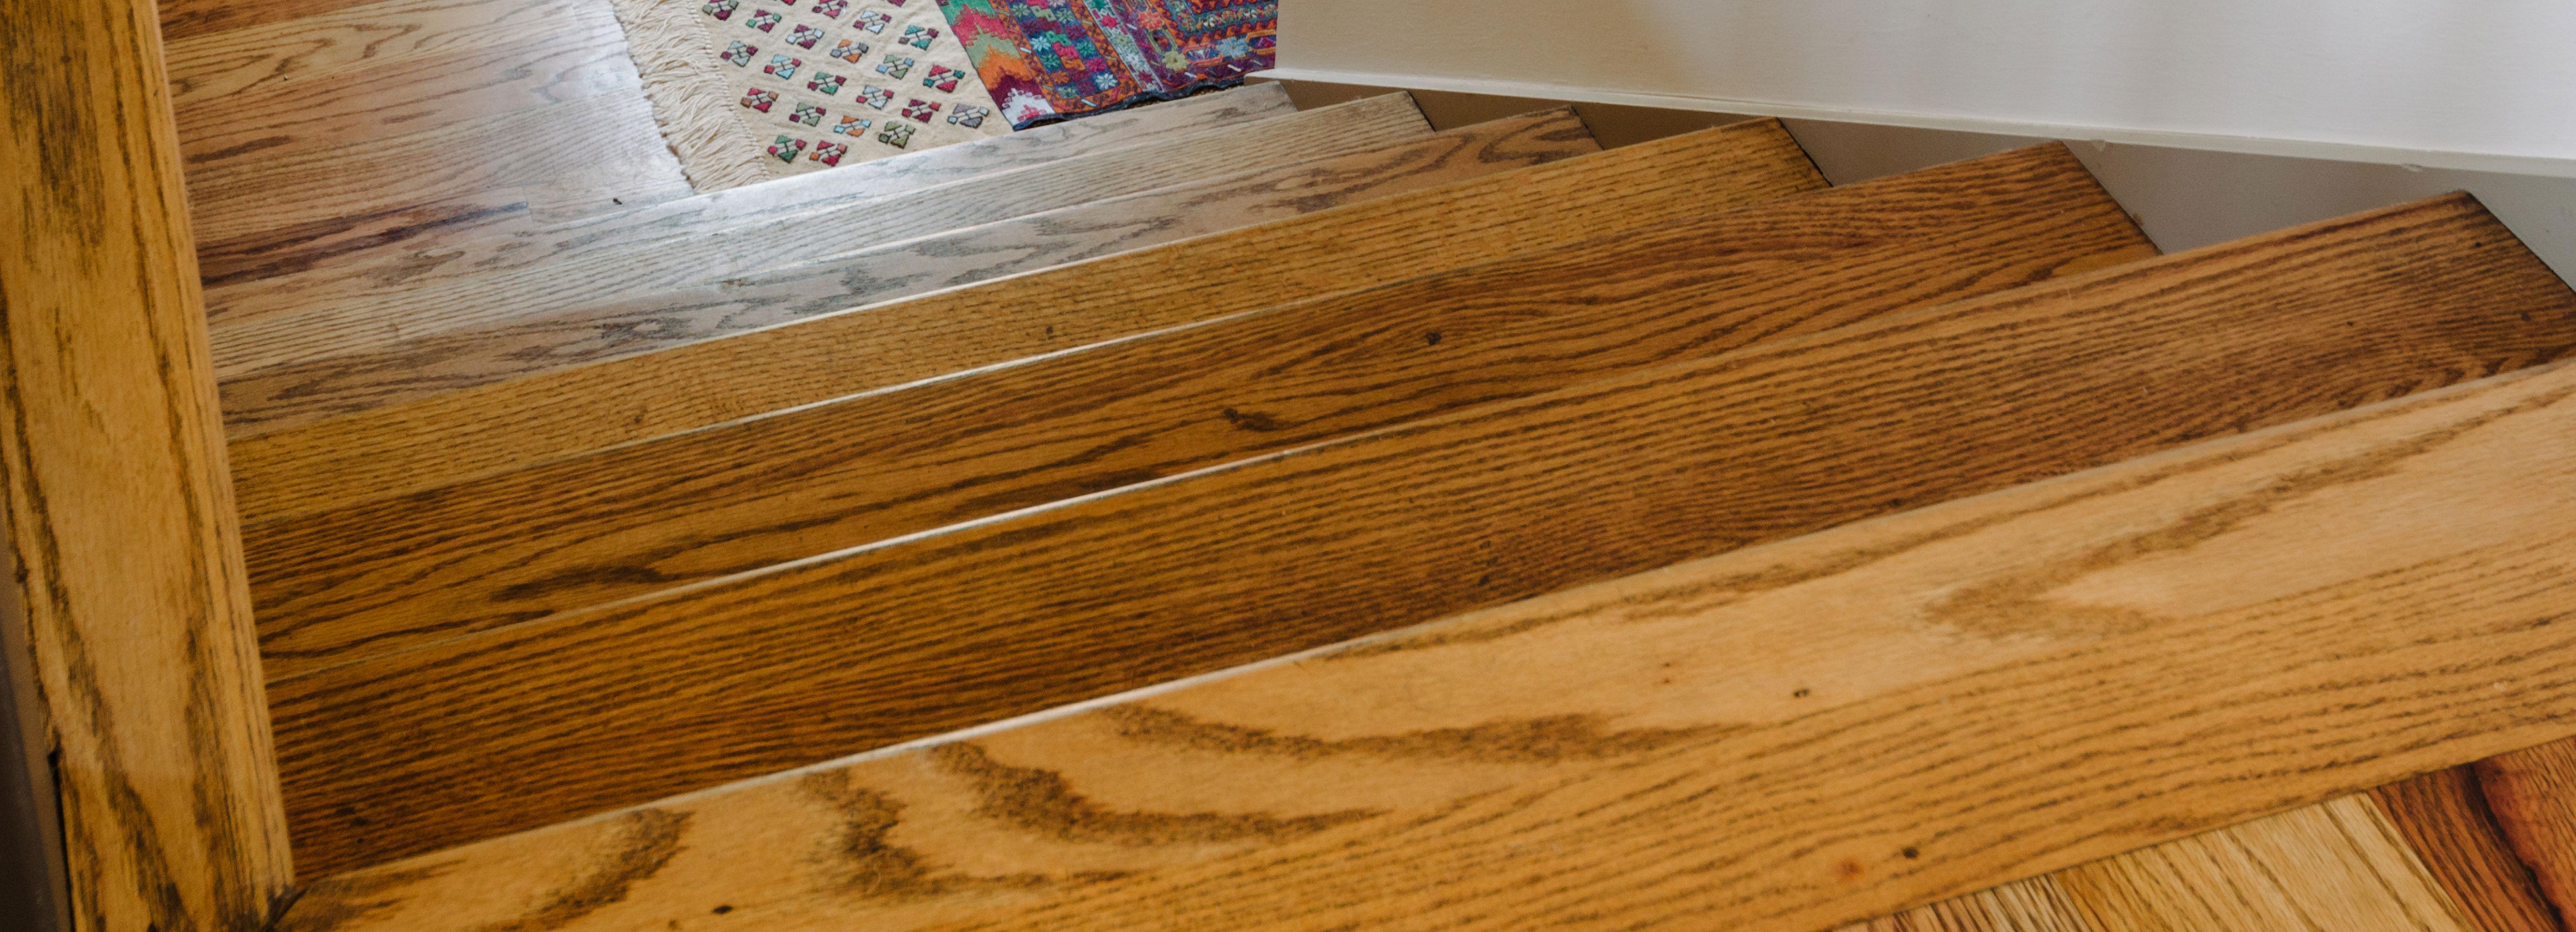 Wooden floor treated with Rubio Monocoat Oil Plus 2C Antique Bronze